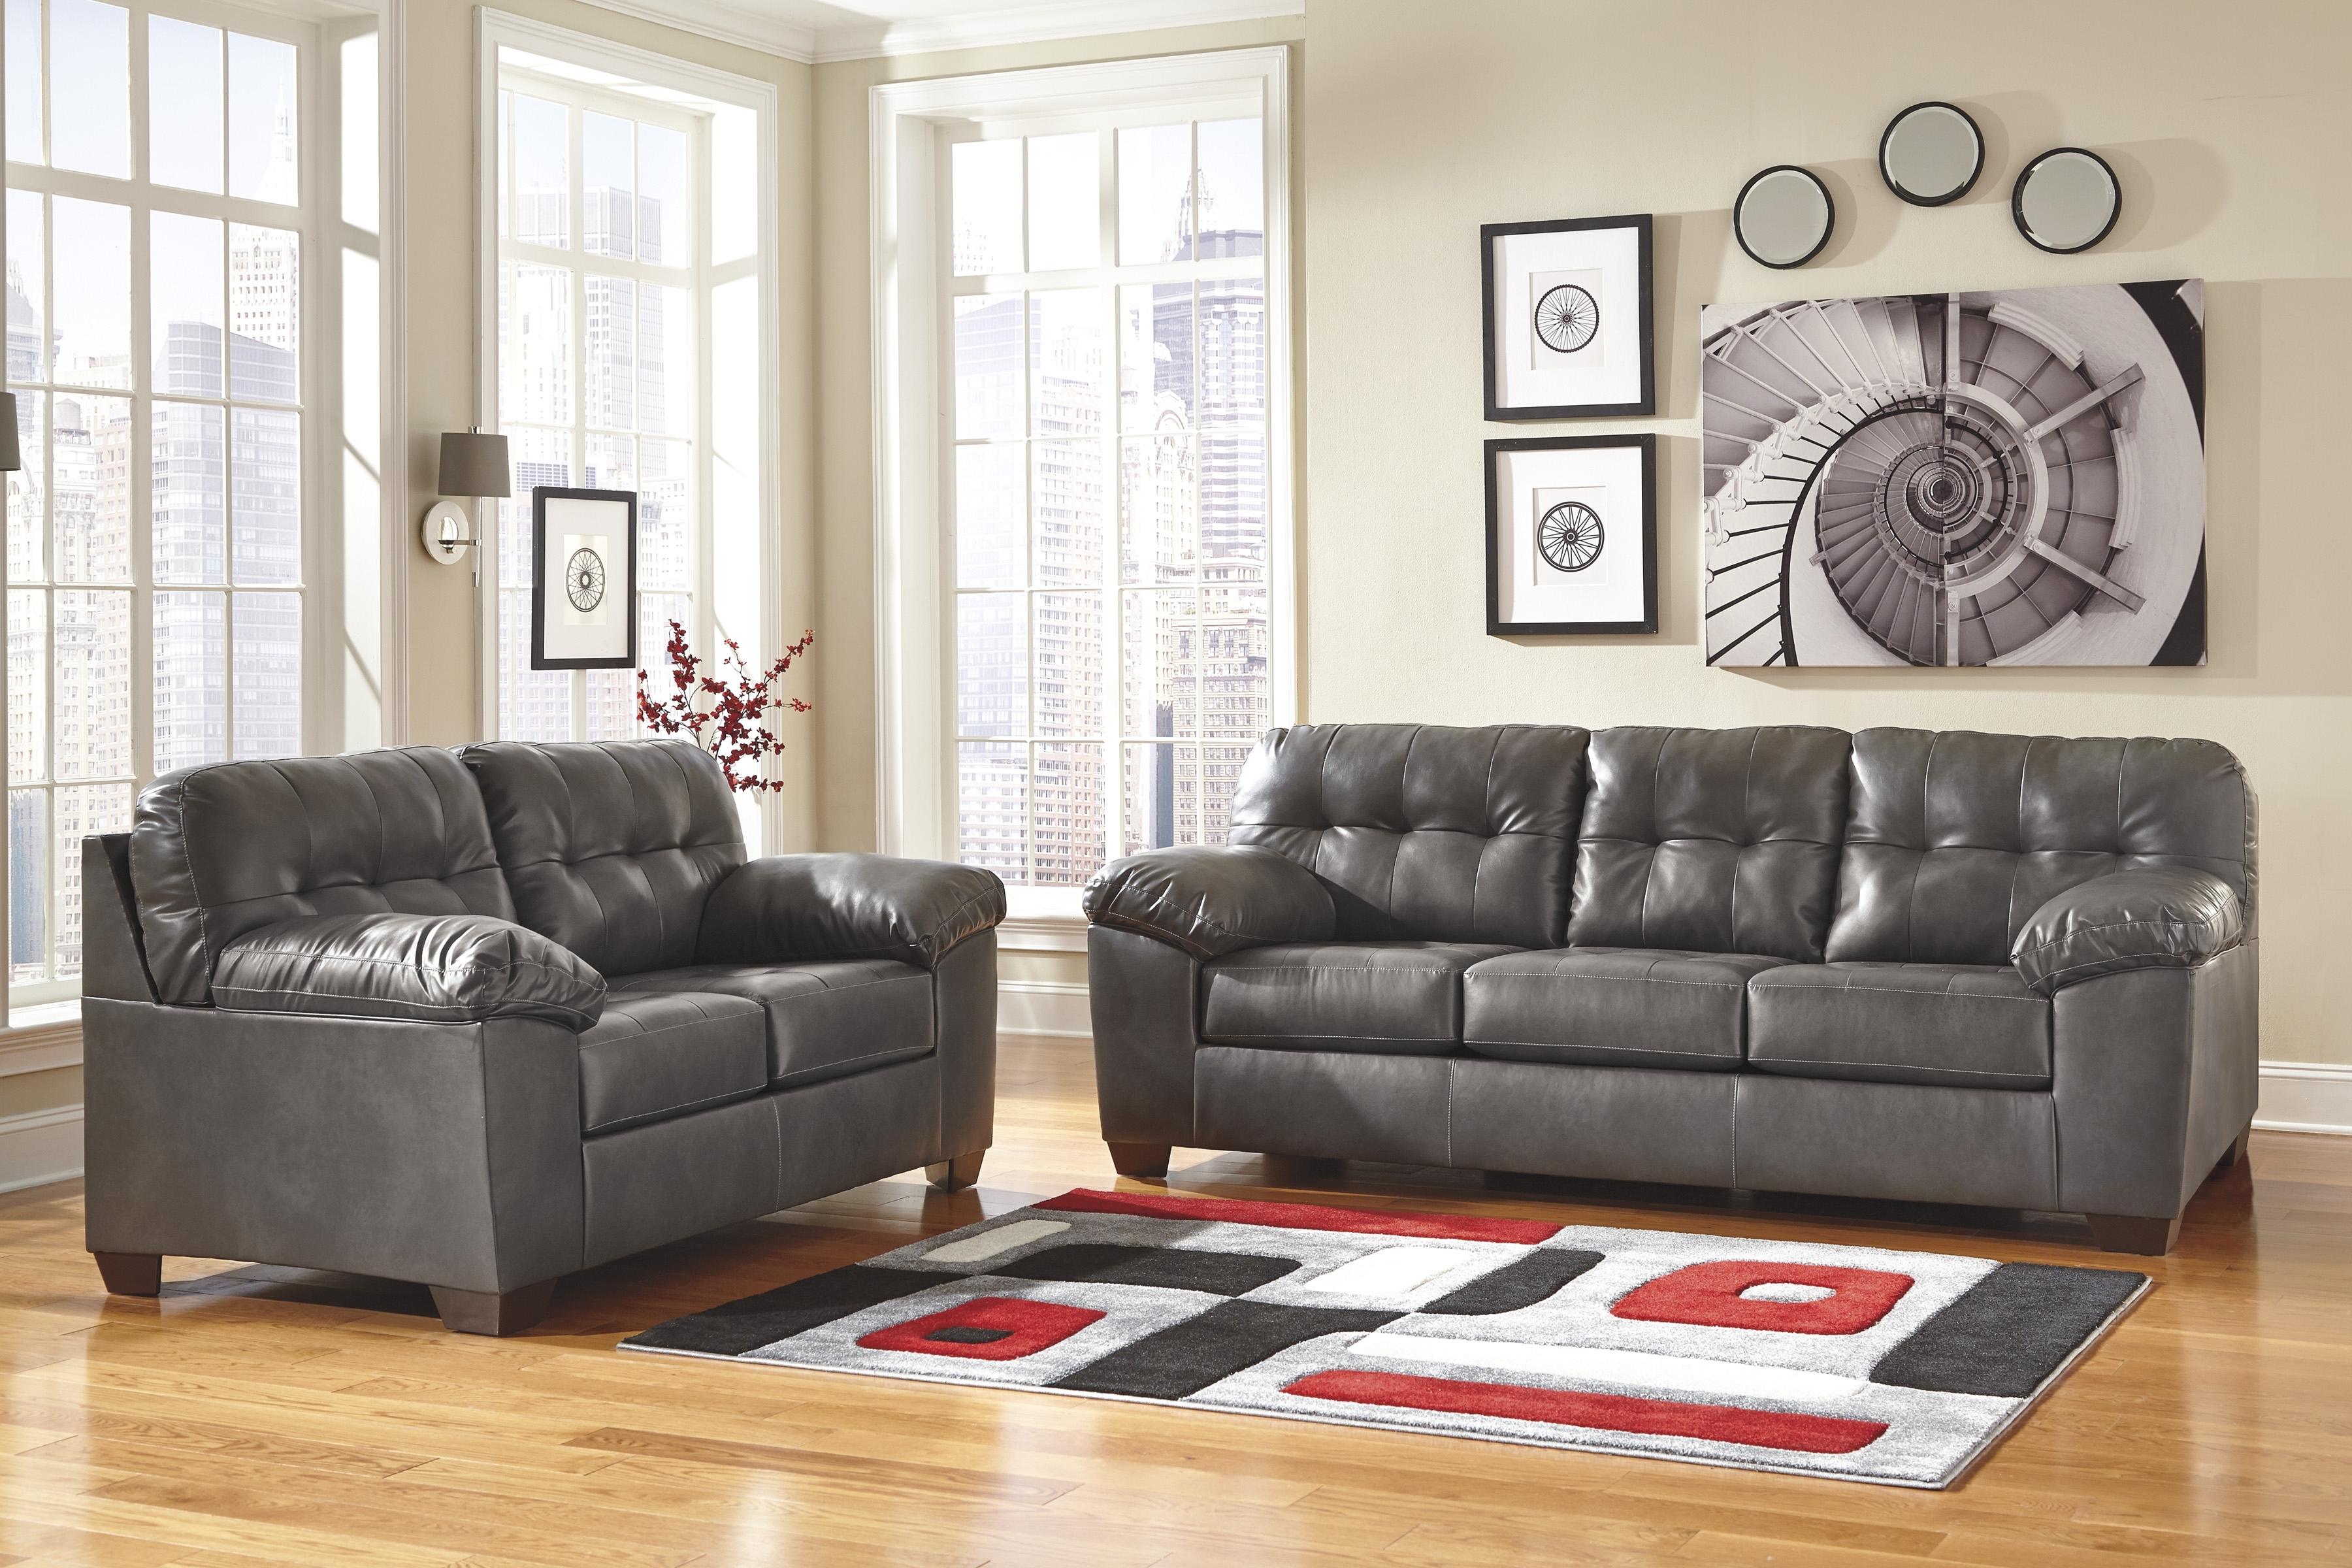 Ashley Furniture Hamiltons Sofa (View 3 of 15)